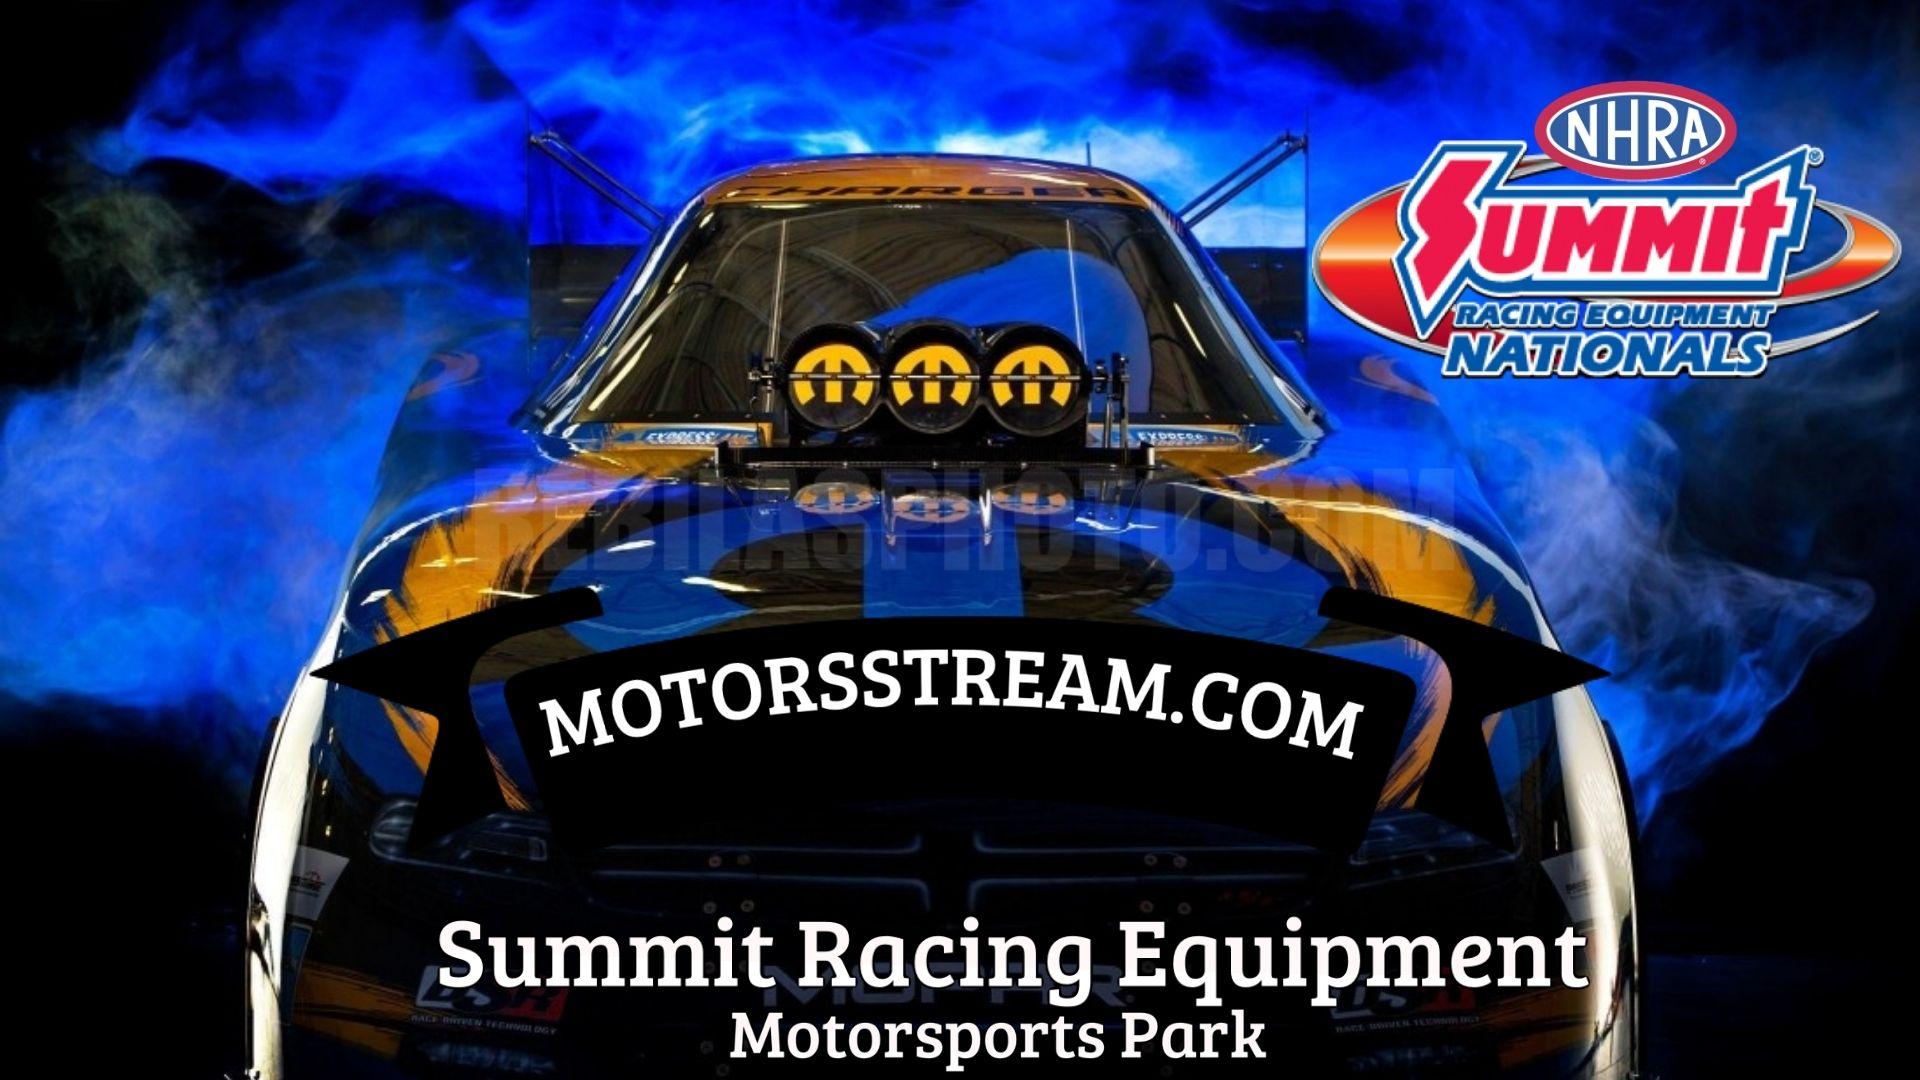 Summit Racing Equipment NHRA Nationals 2021 Live Stream